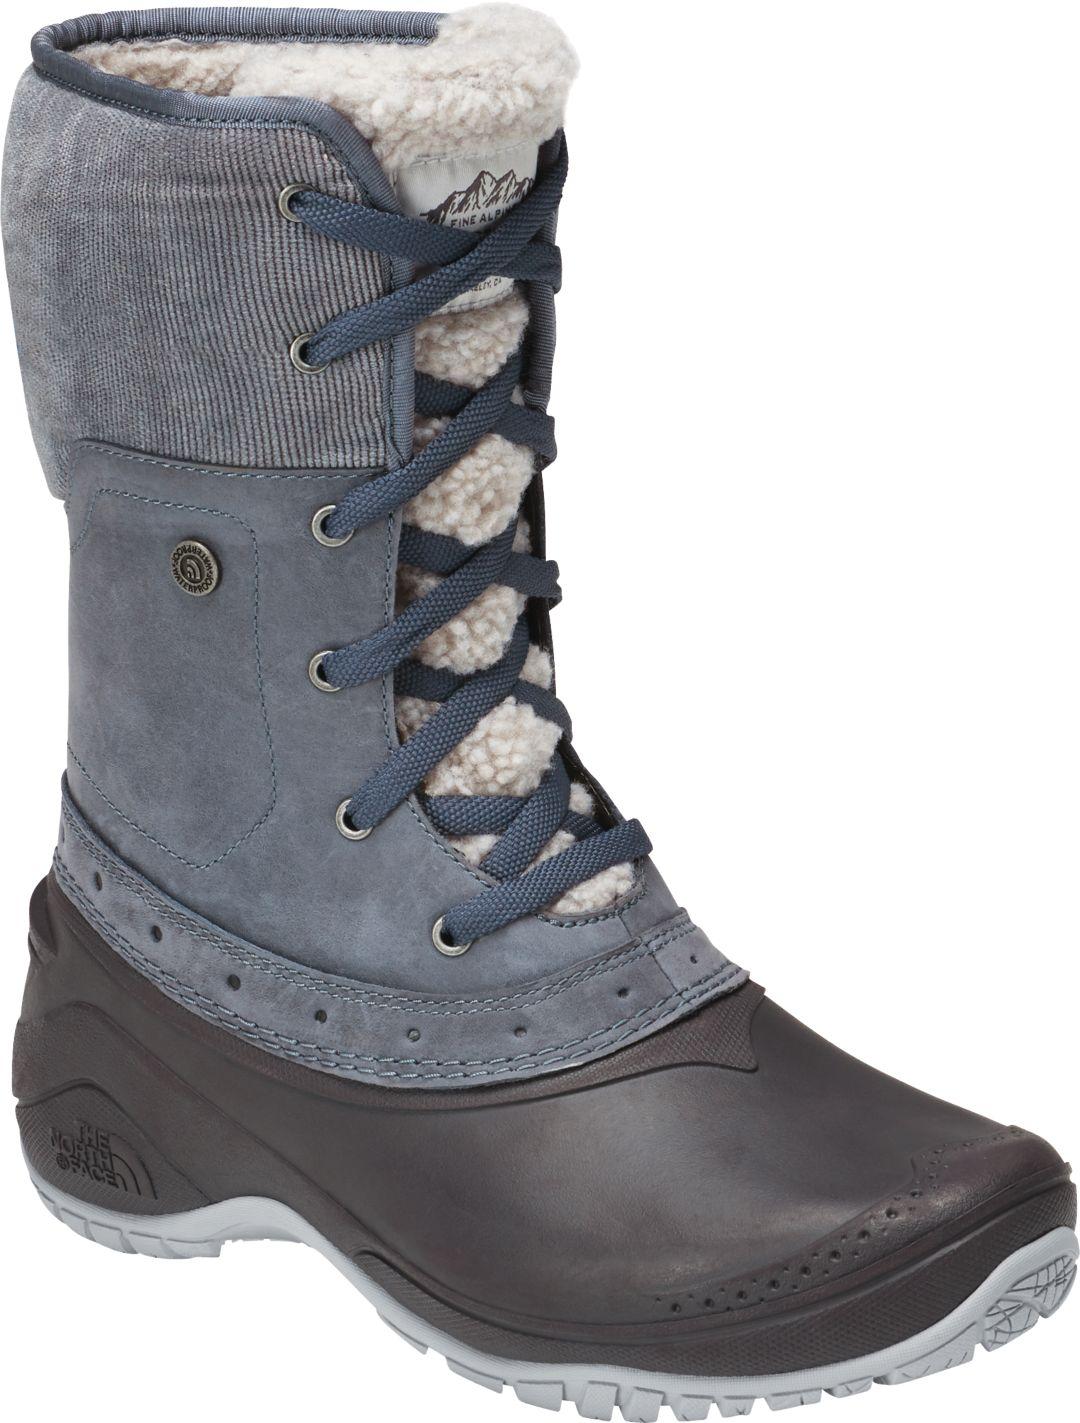 71b0d22ff5547 The North Face Women's Shellista Roll-Down 200g Waterproof Winter Boots 1